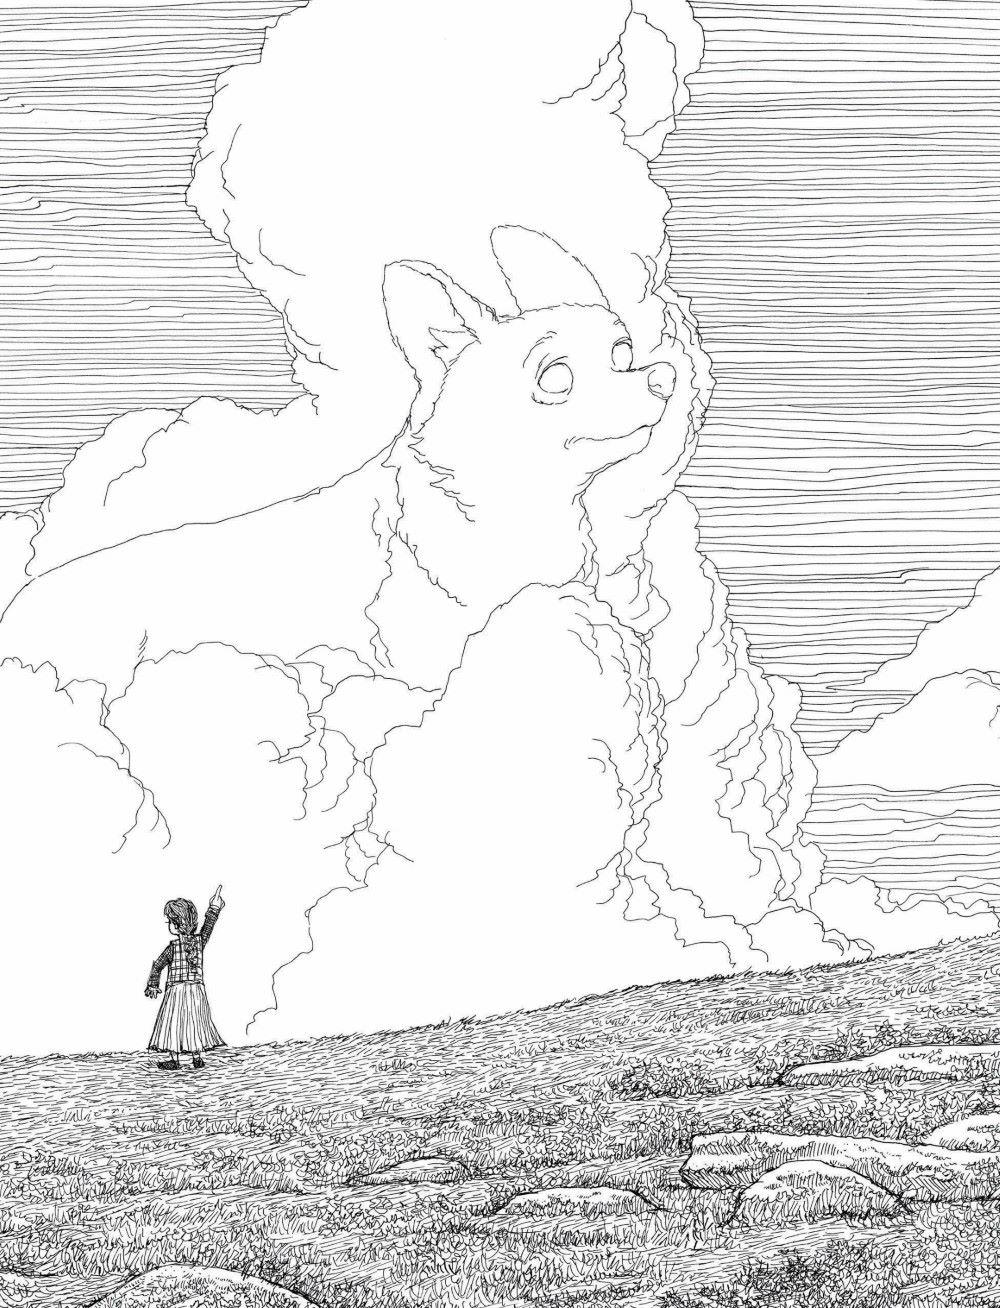 Korgi-Book-05_pr-5 ComicList Previews: KORGI VOLUME 5 END OF SEASONS GN